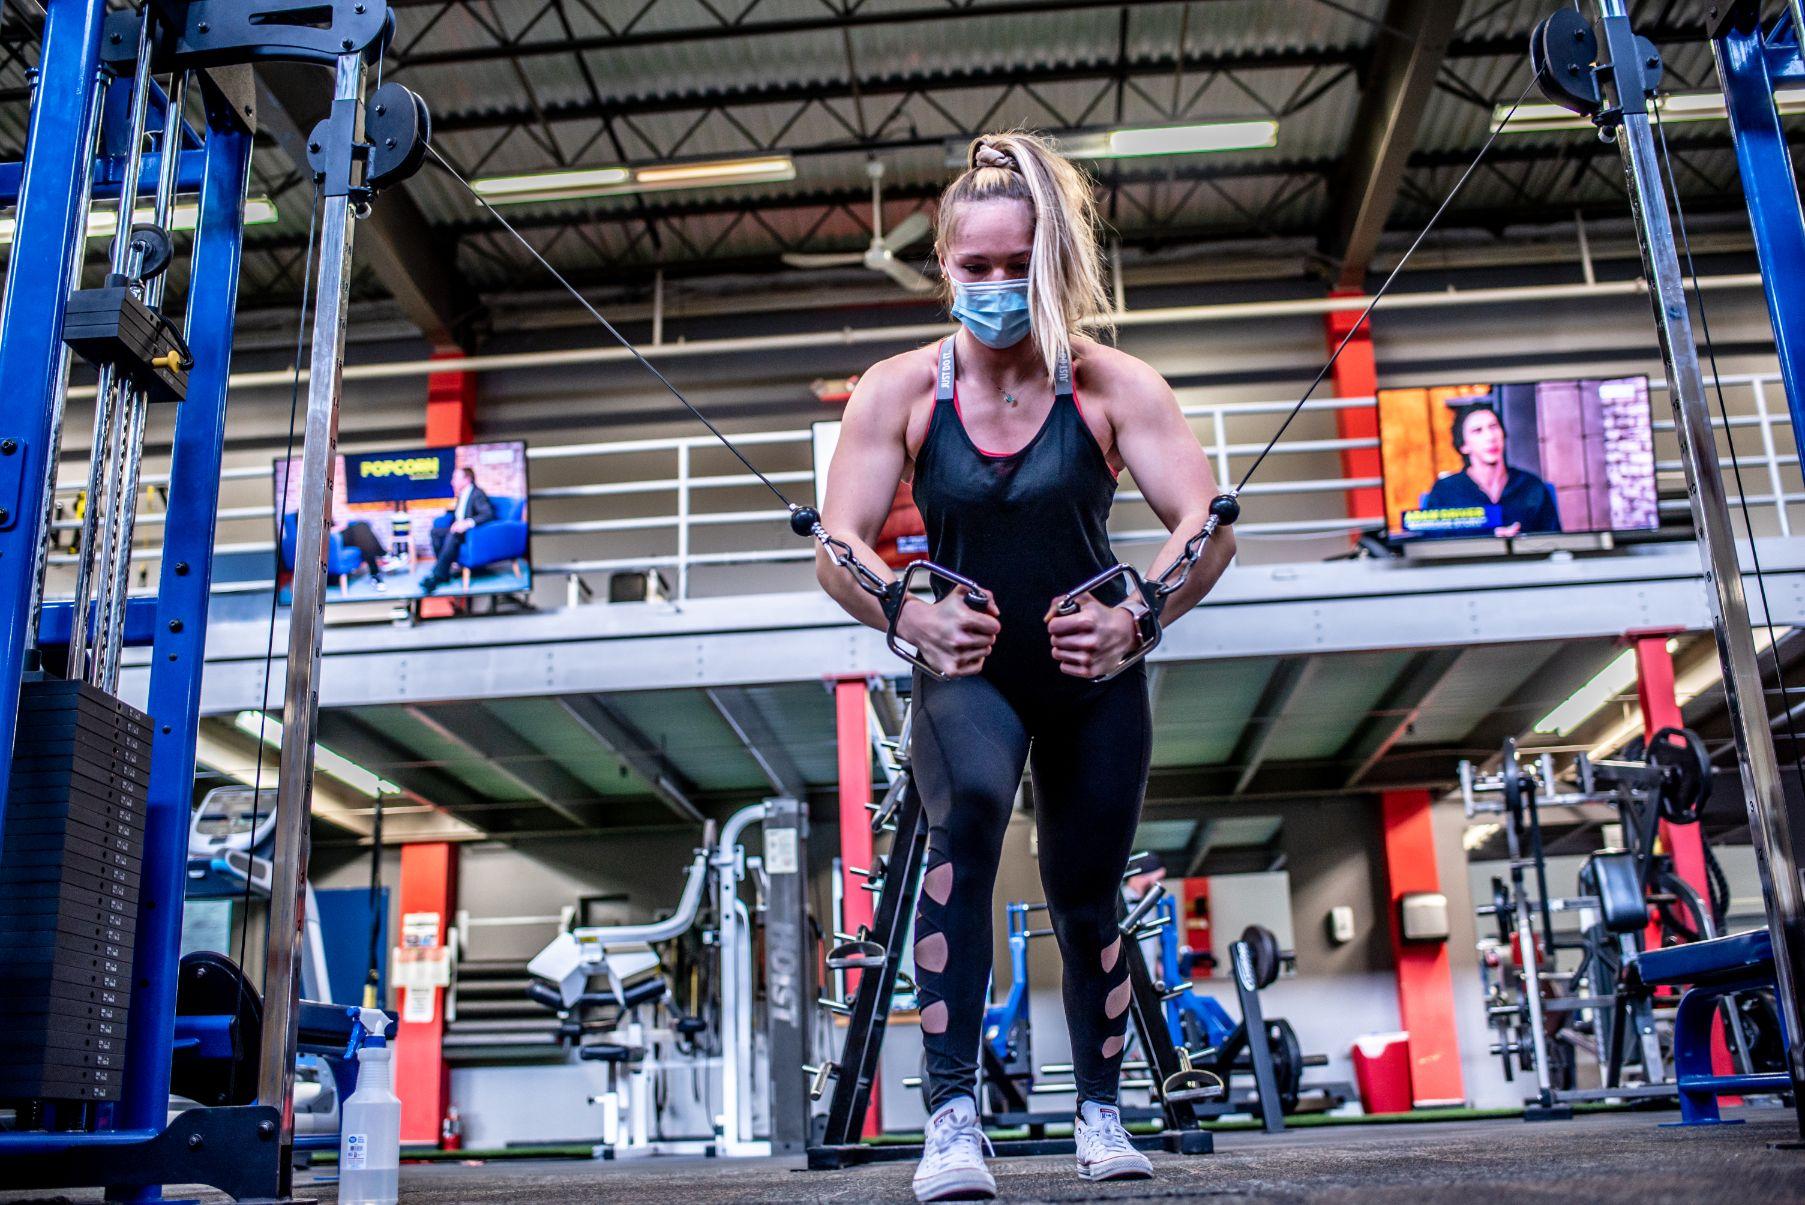 Healthplex Fitness Clifton Park NY Train on You Own